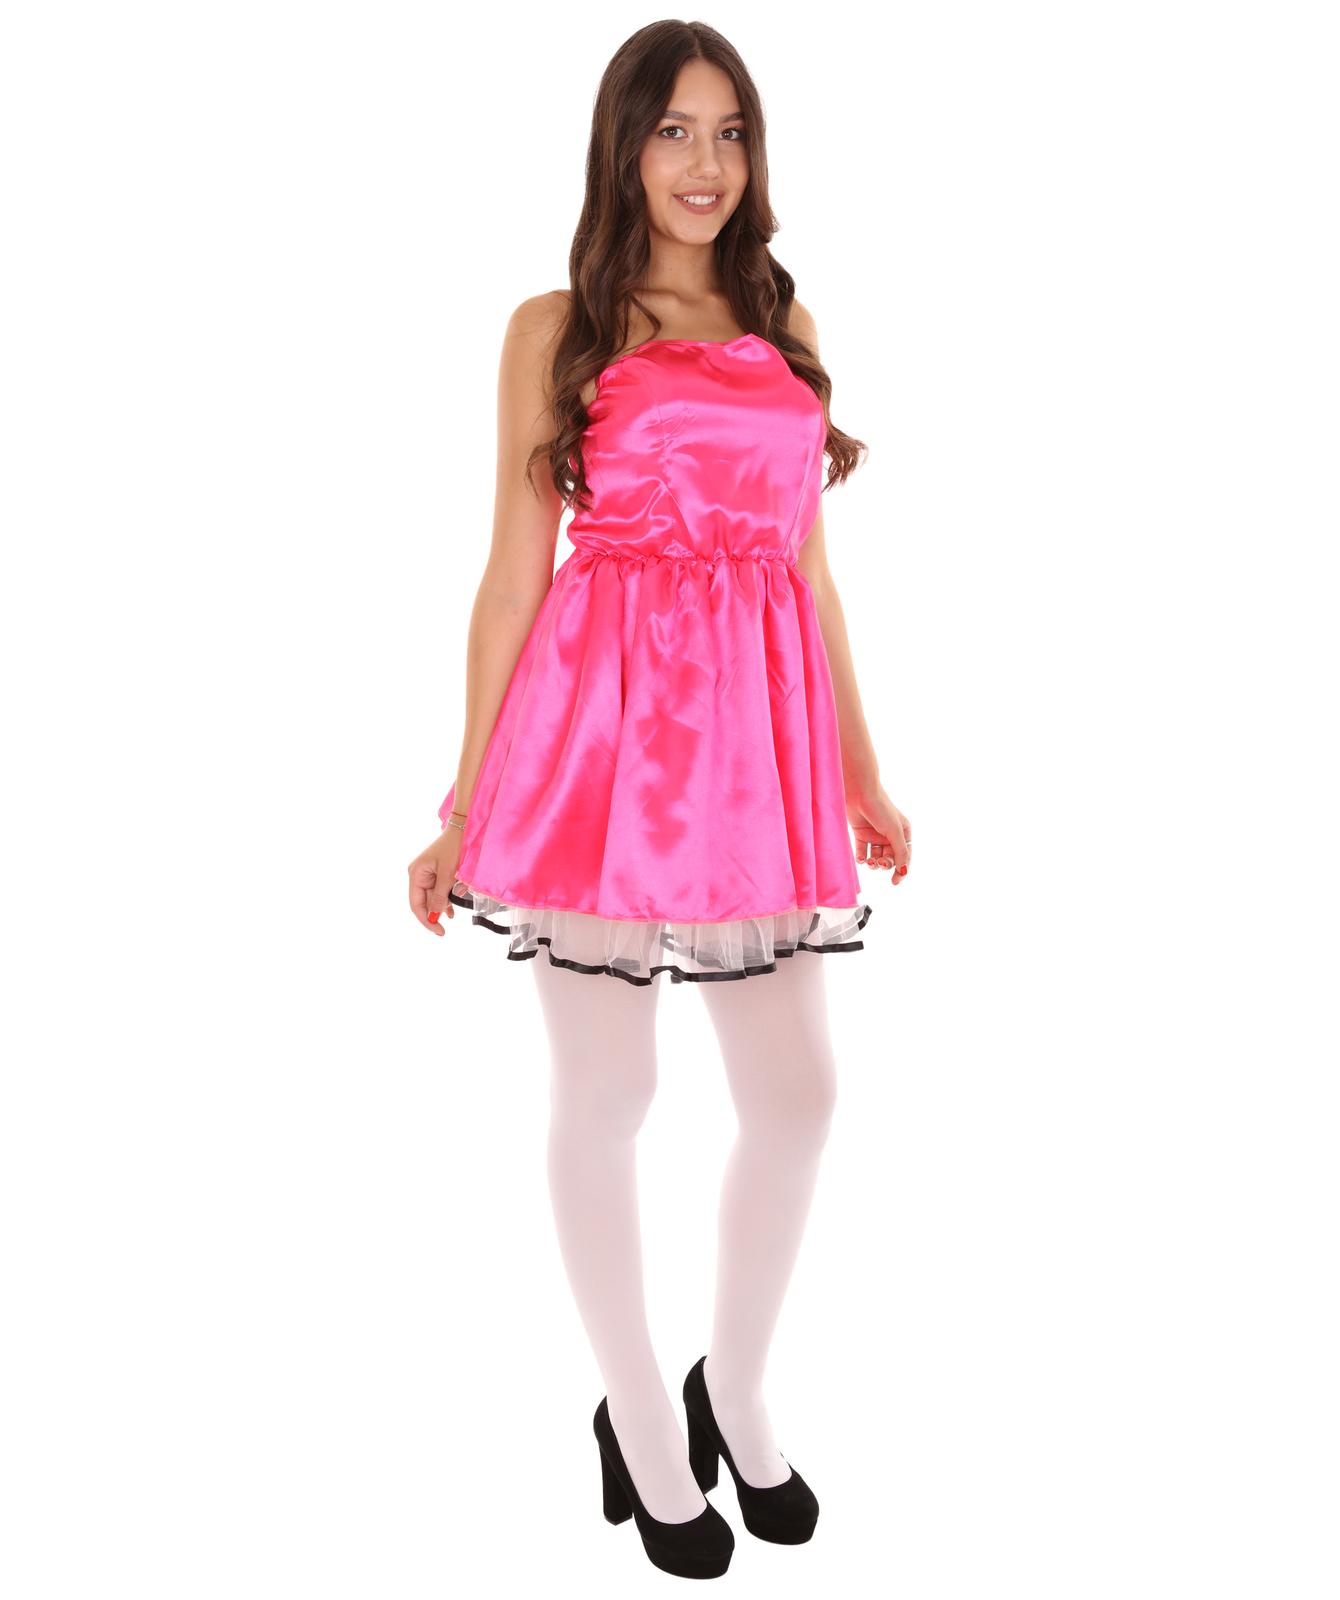 Adult Women's 50s Prom Dress Costume | Dark Pink Cosplay Costume - £29.71 GBP